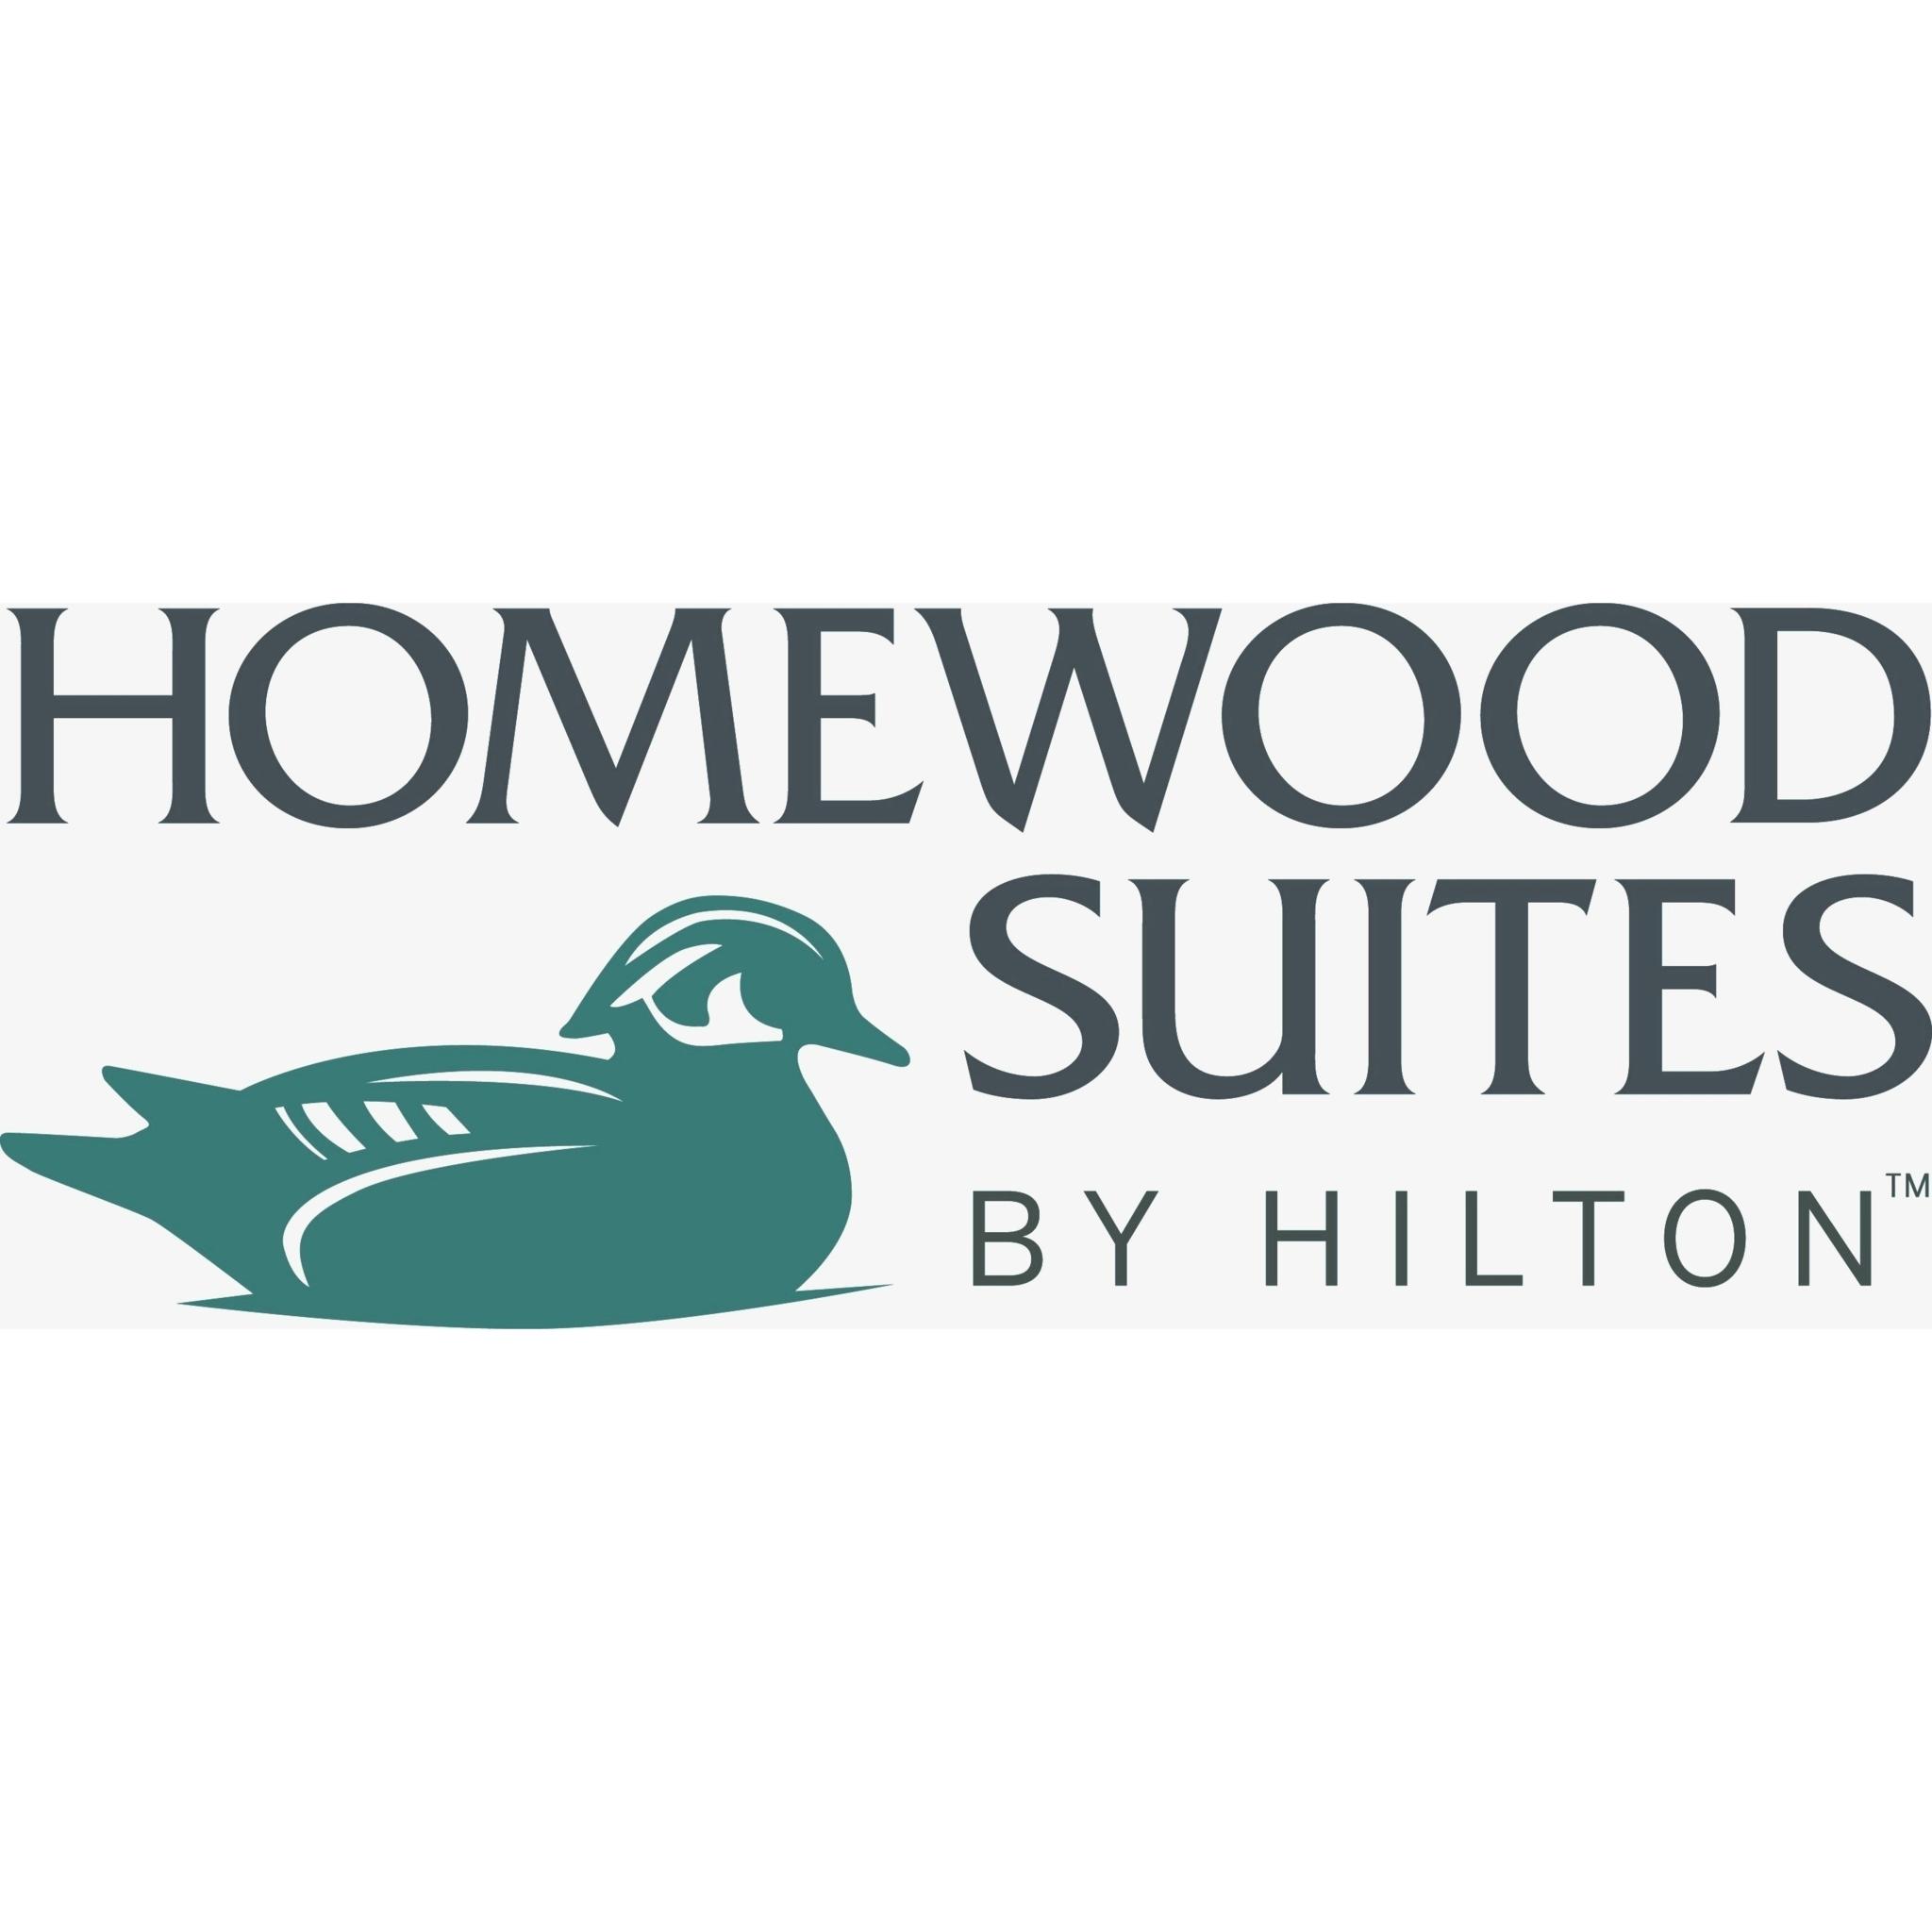 Homewood Suites by Hilton Ajax, Ontario, Canada - Hotels